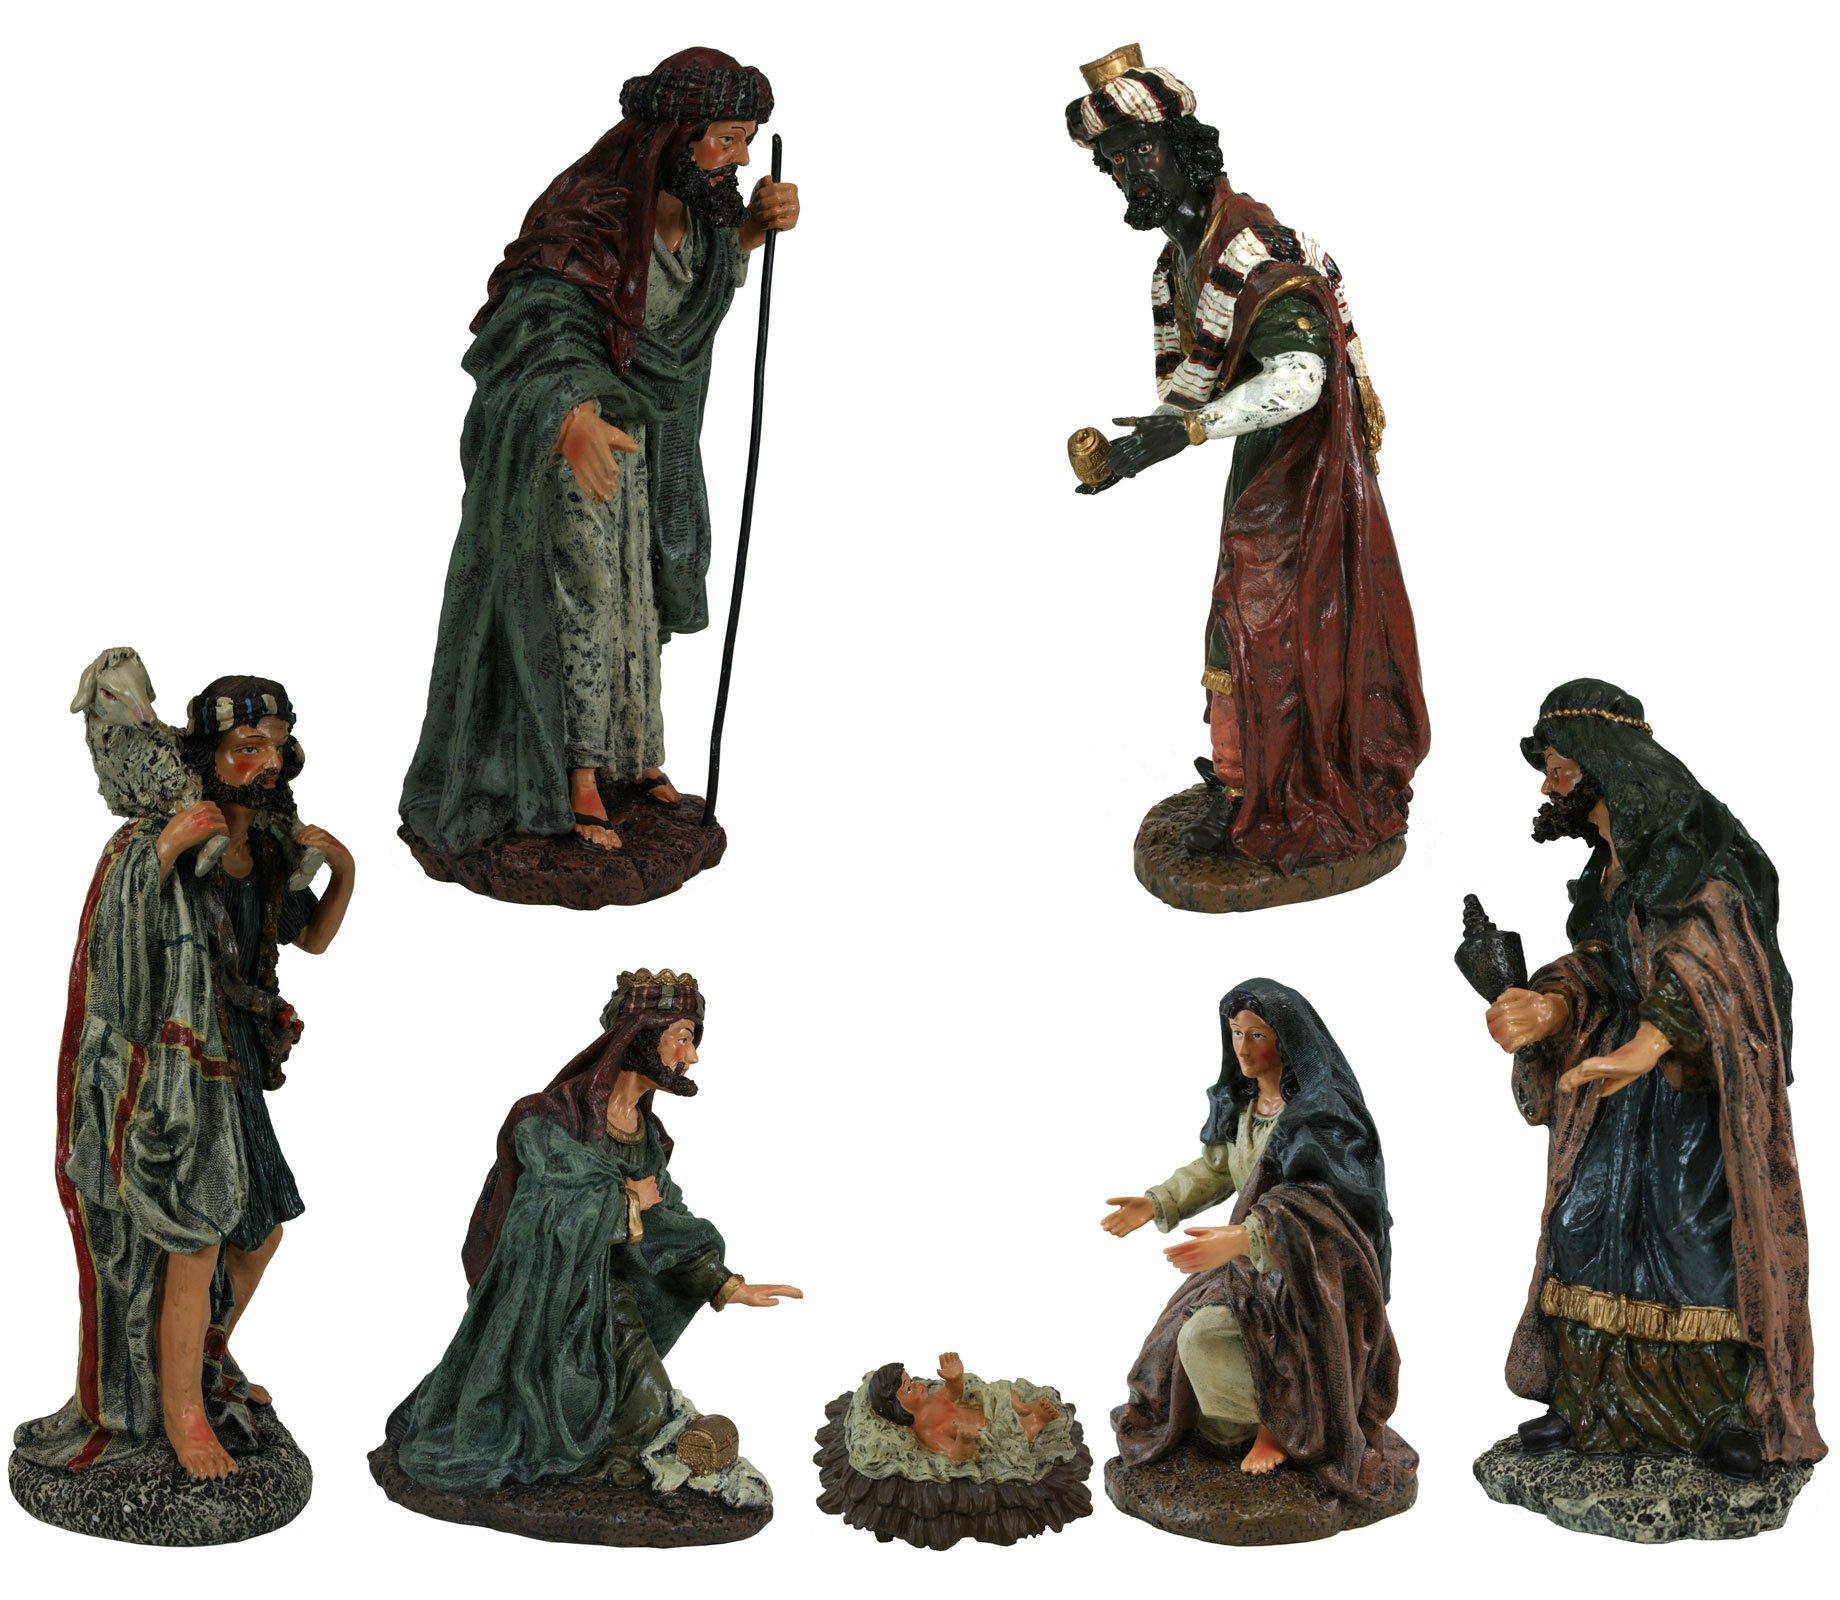 7 Piece Tuscan Christmas Nativity Scenes [27406] by Nativity Figurines